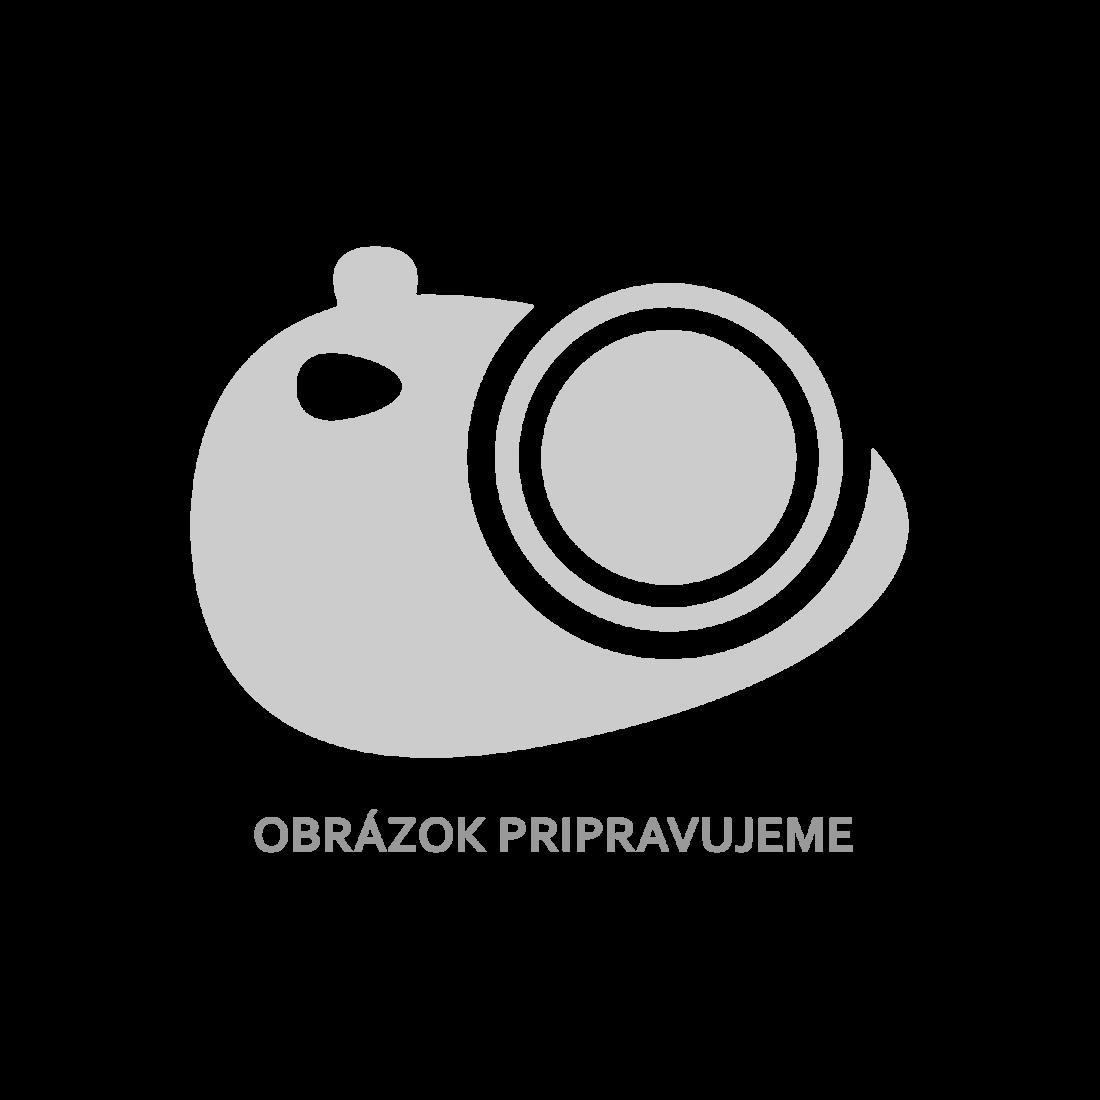 Hnedý drevený regál s 3 pletenými košíkmi